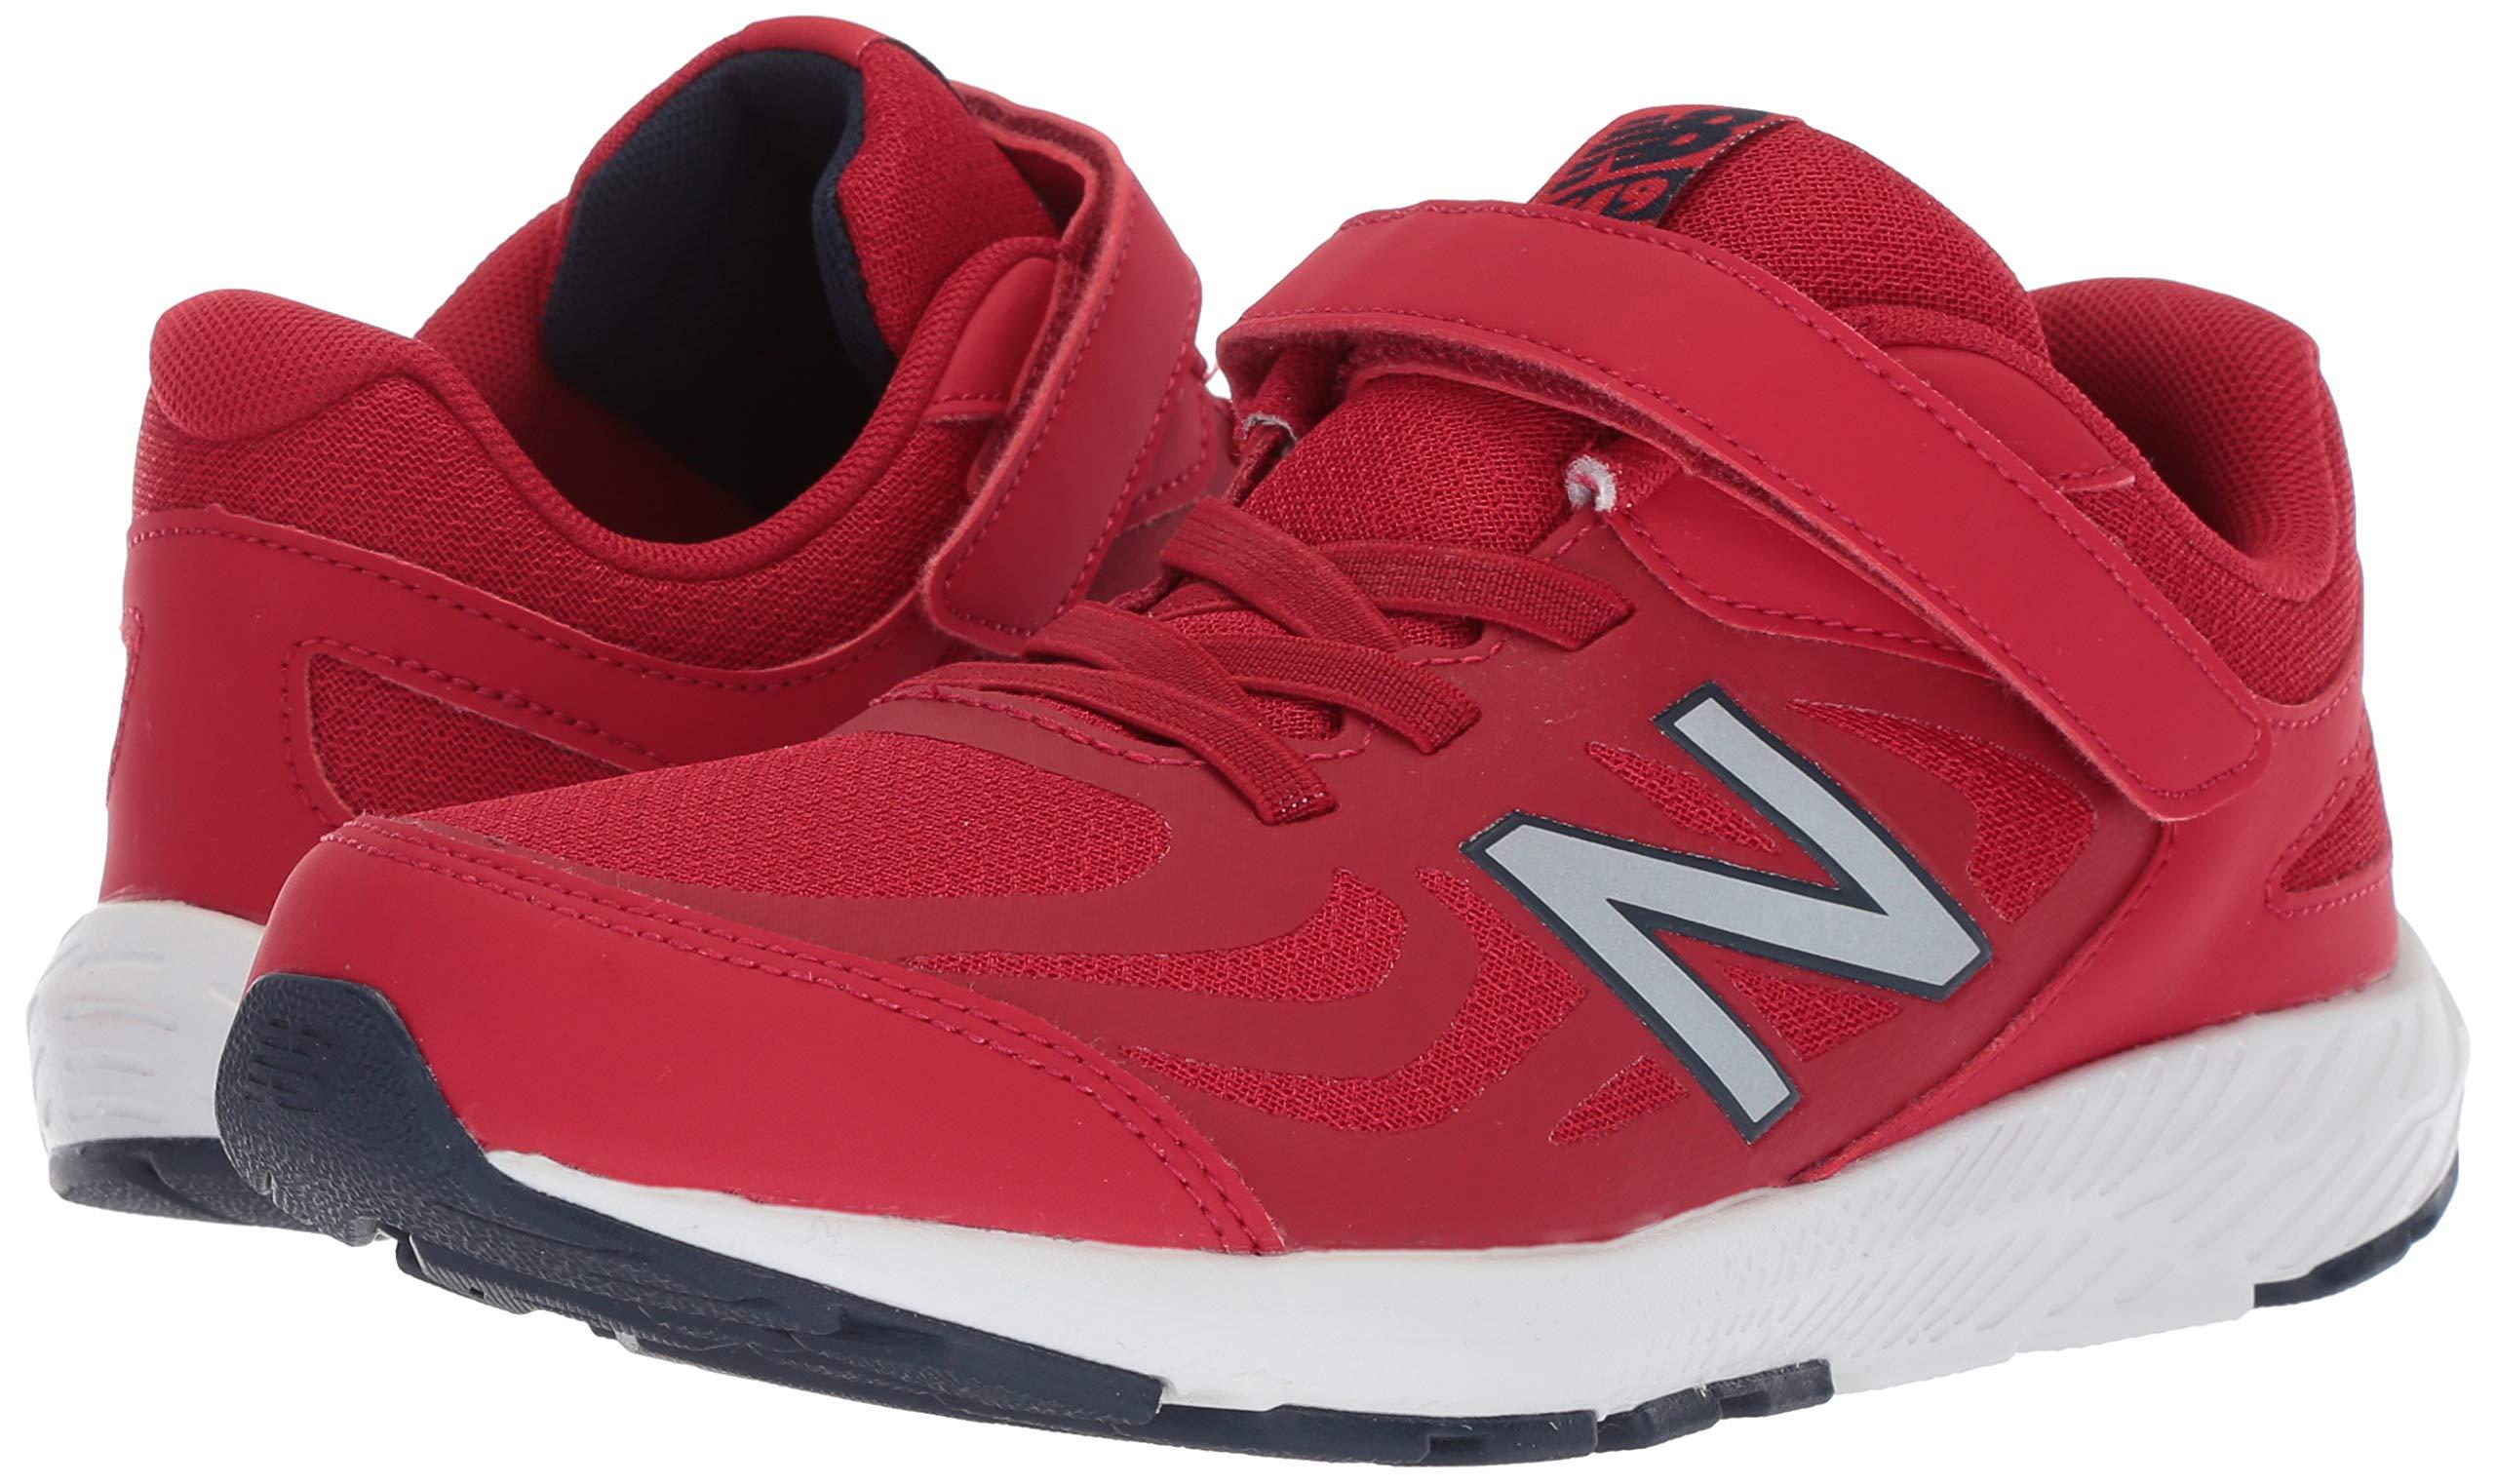 New Balance Boys' 519v1 Hook and Loop Running Shoe, Chili Pepper/Nubuck Scarlet, 2 M US Infant by New Balance (Image #6)